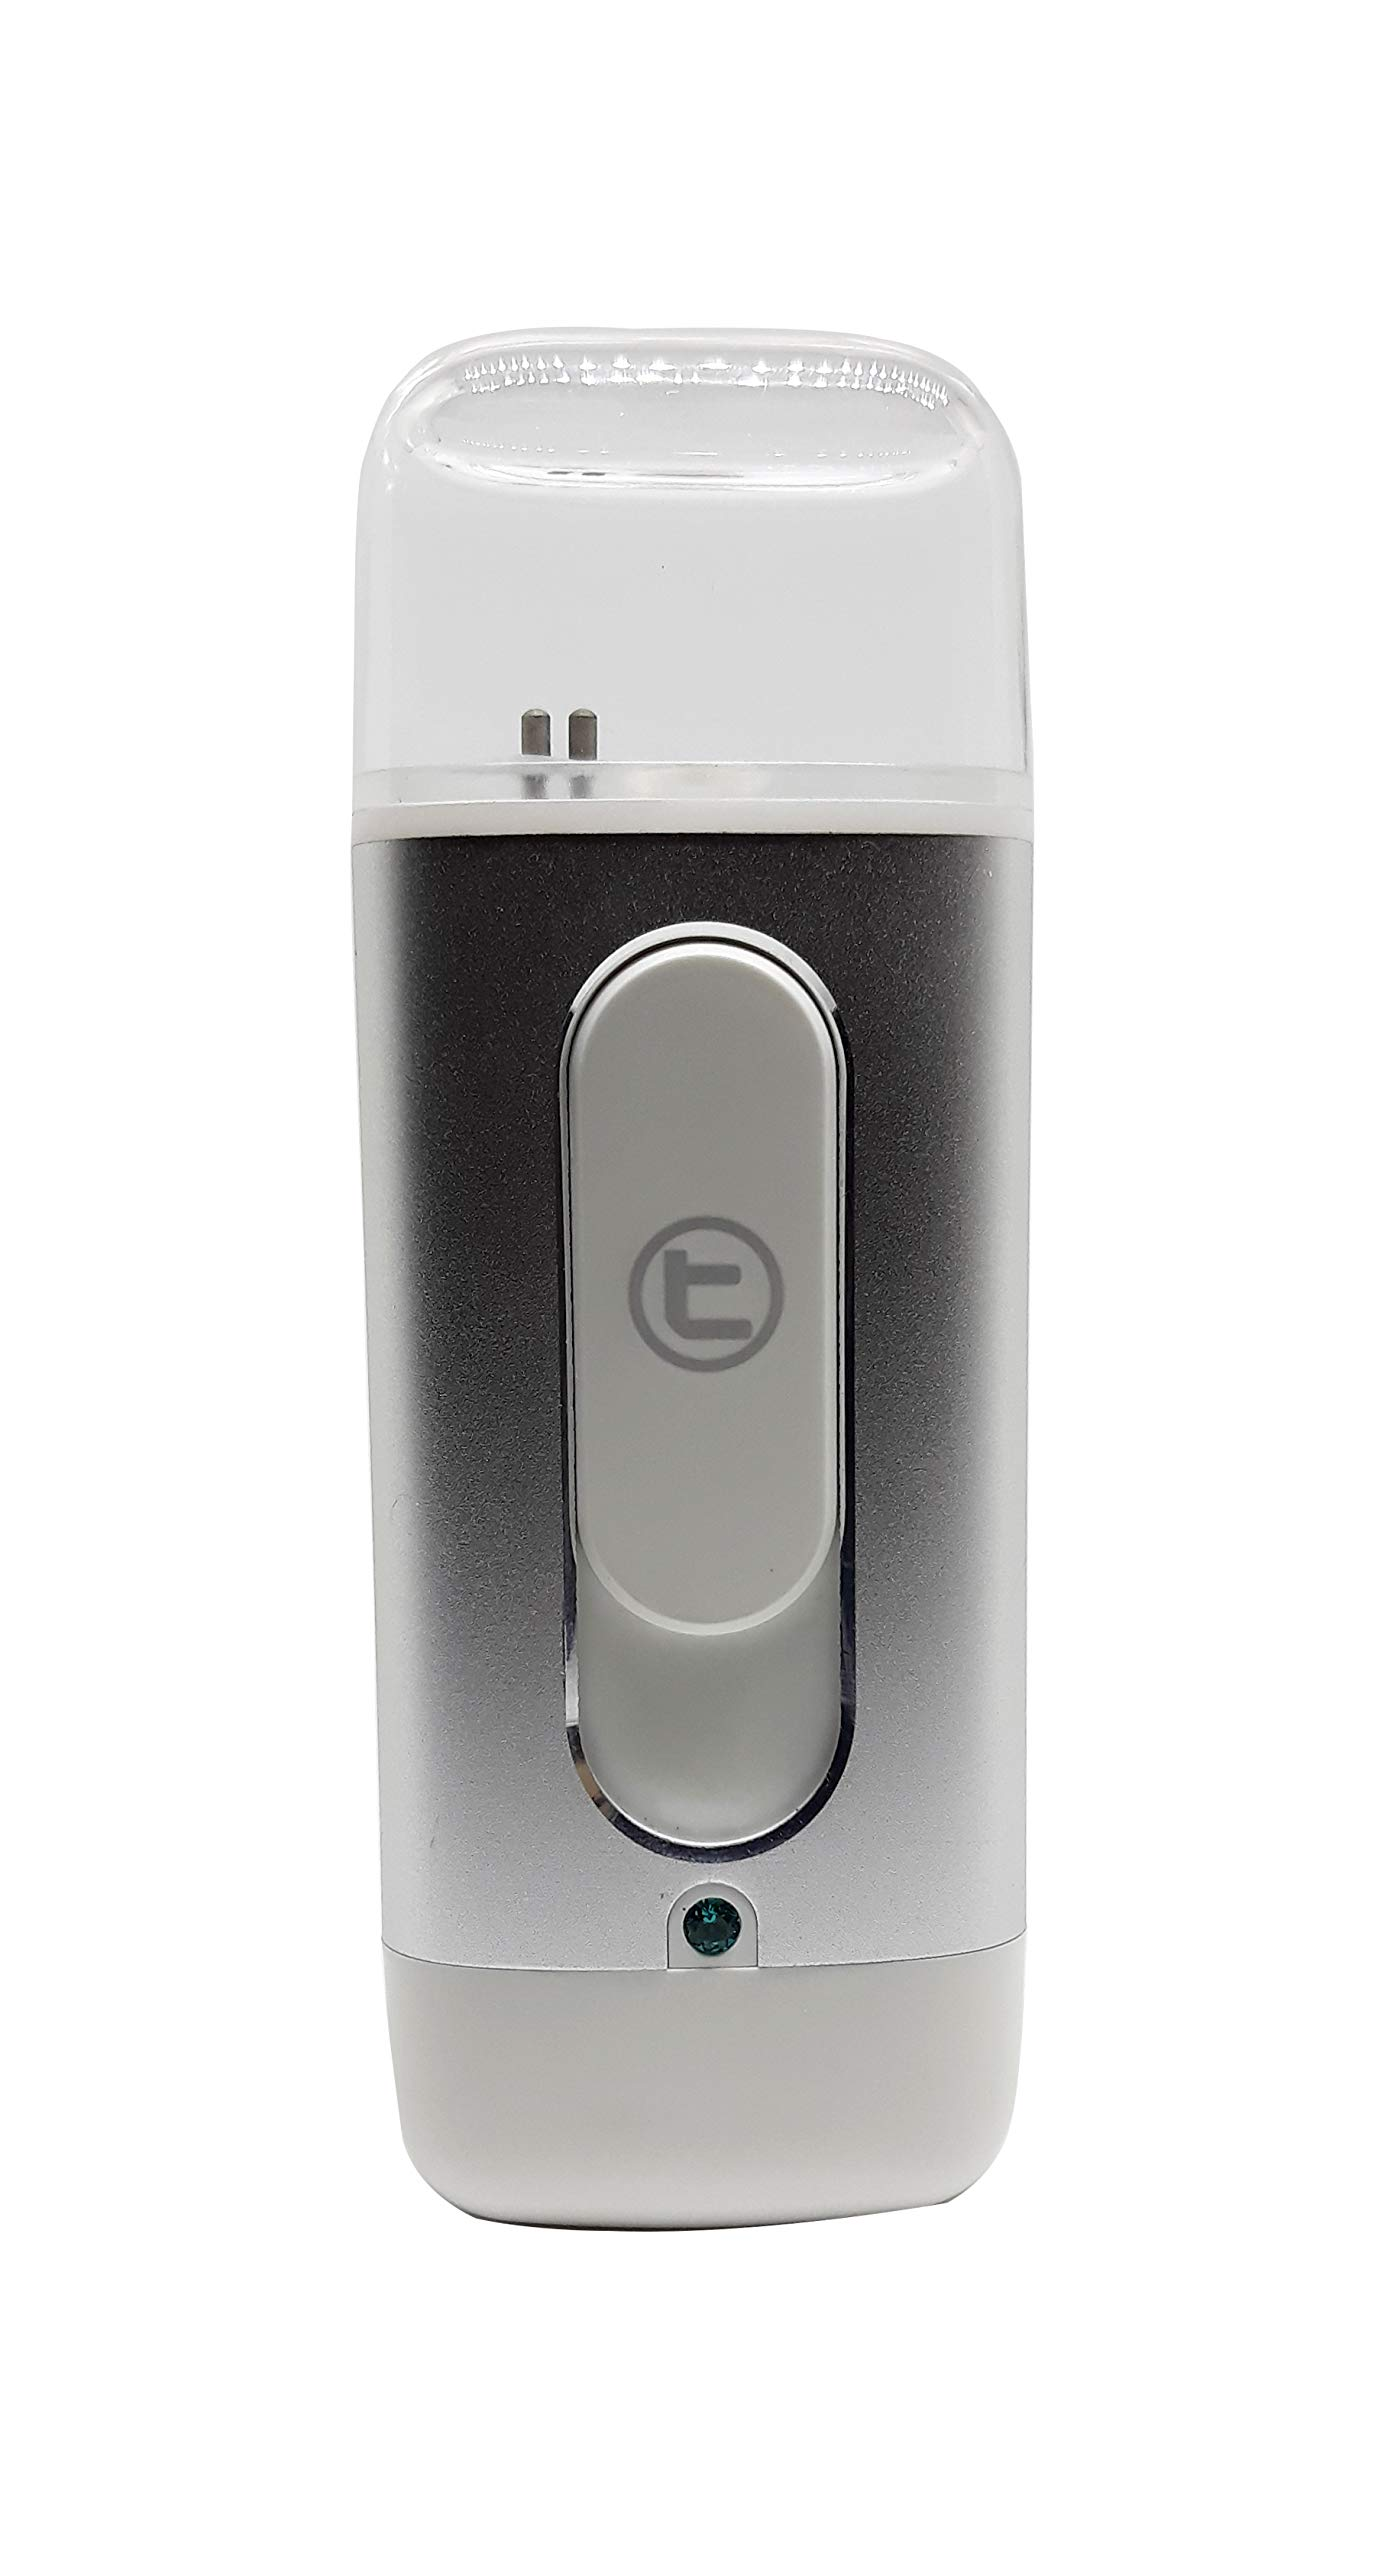 Tronic Hydrogen Water Therapy Mist - Portable Mini Size USB Powered - Skin Analysis BIA Sensor